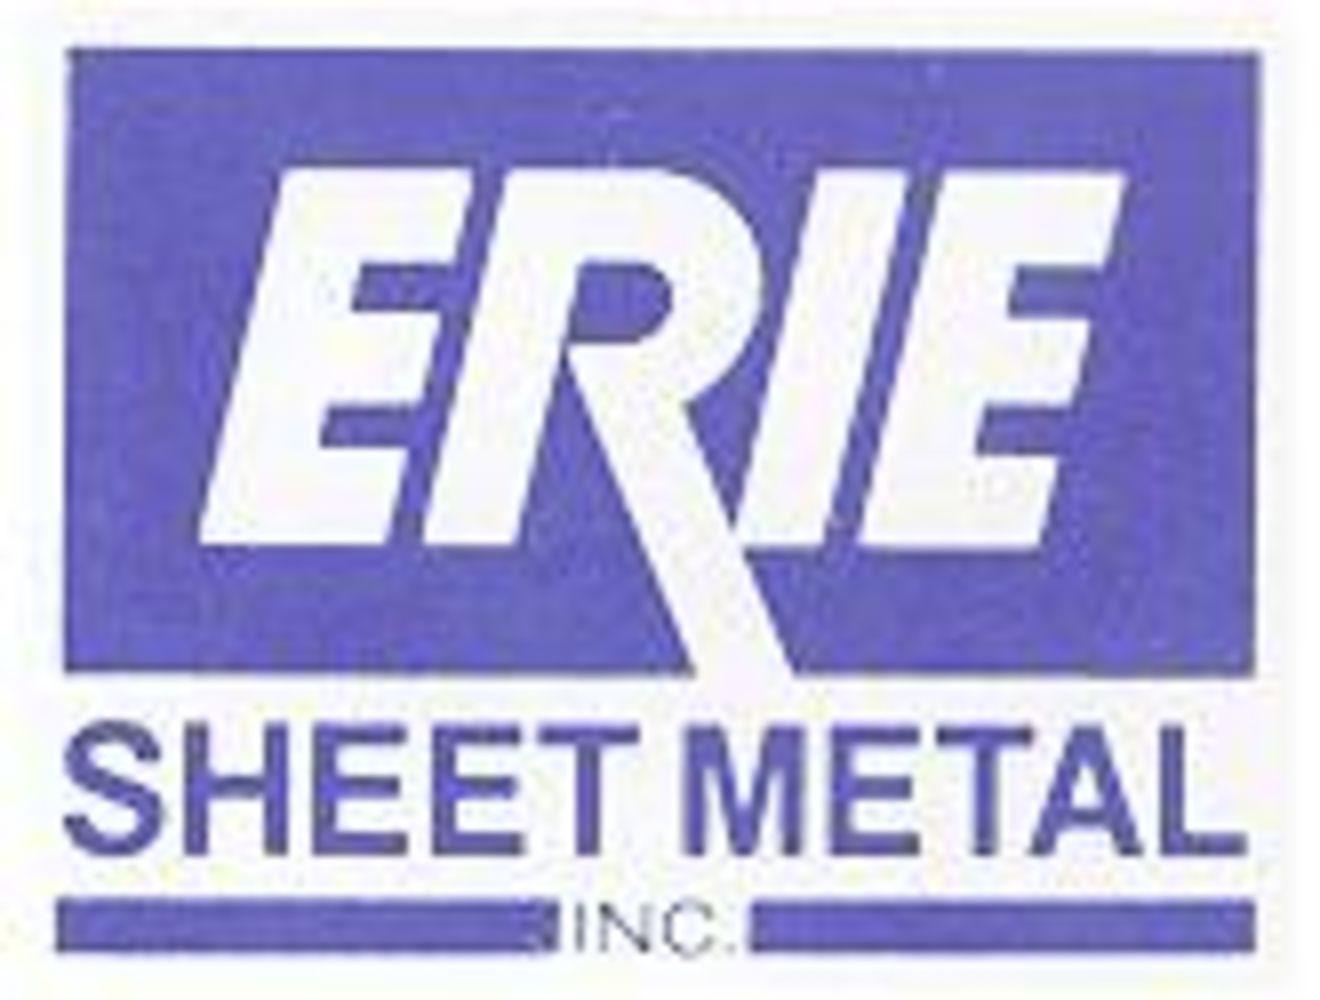 Erie Sheet Metal Inc.